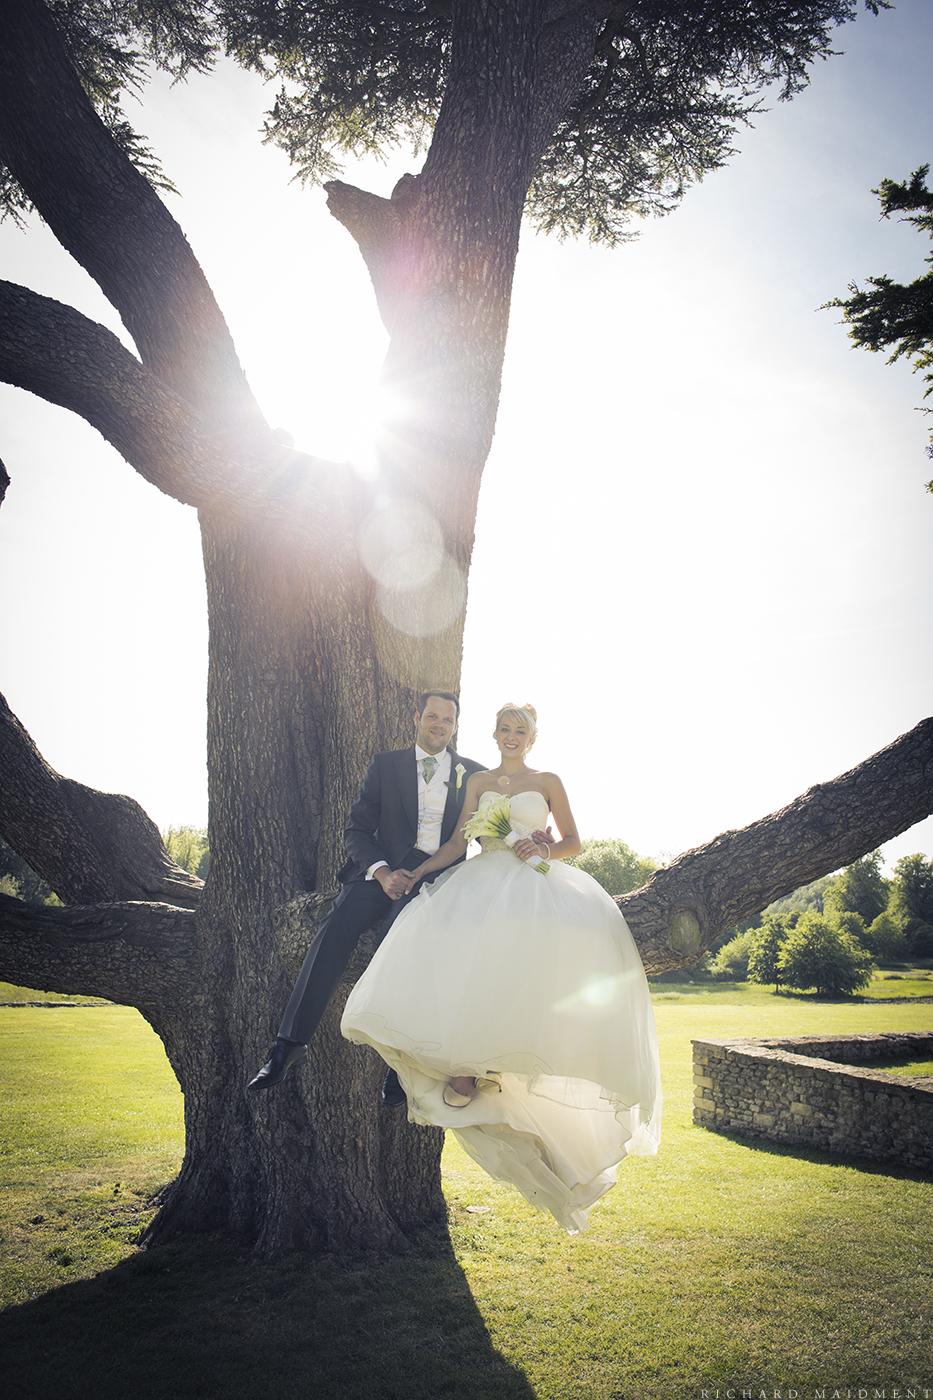 Richard Maidment - Wedding Photography (121).jpg